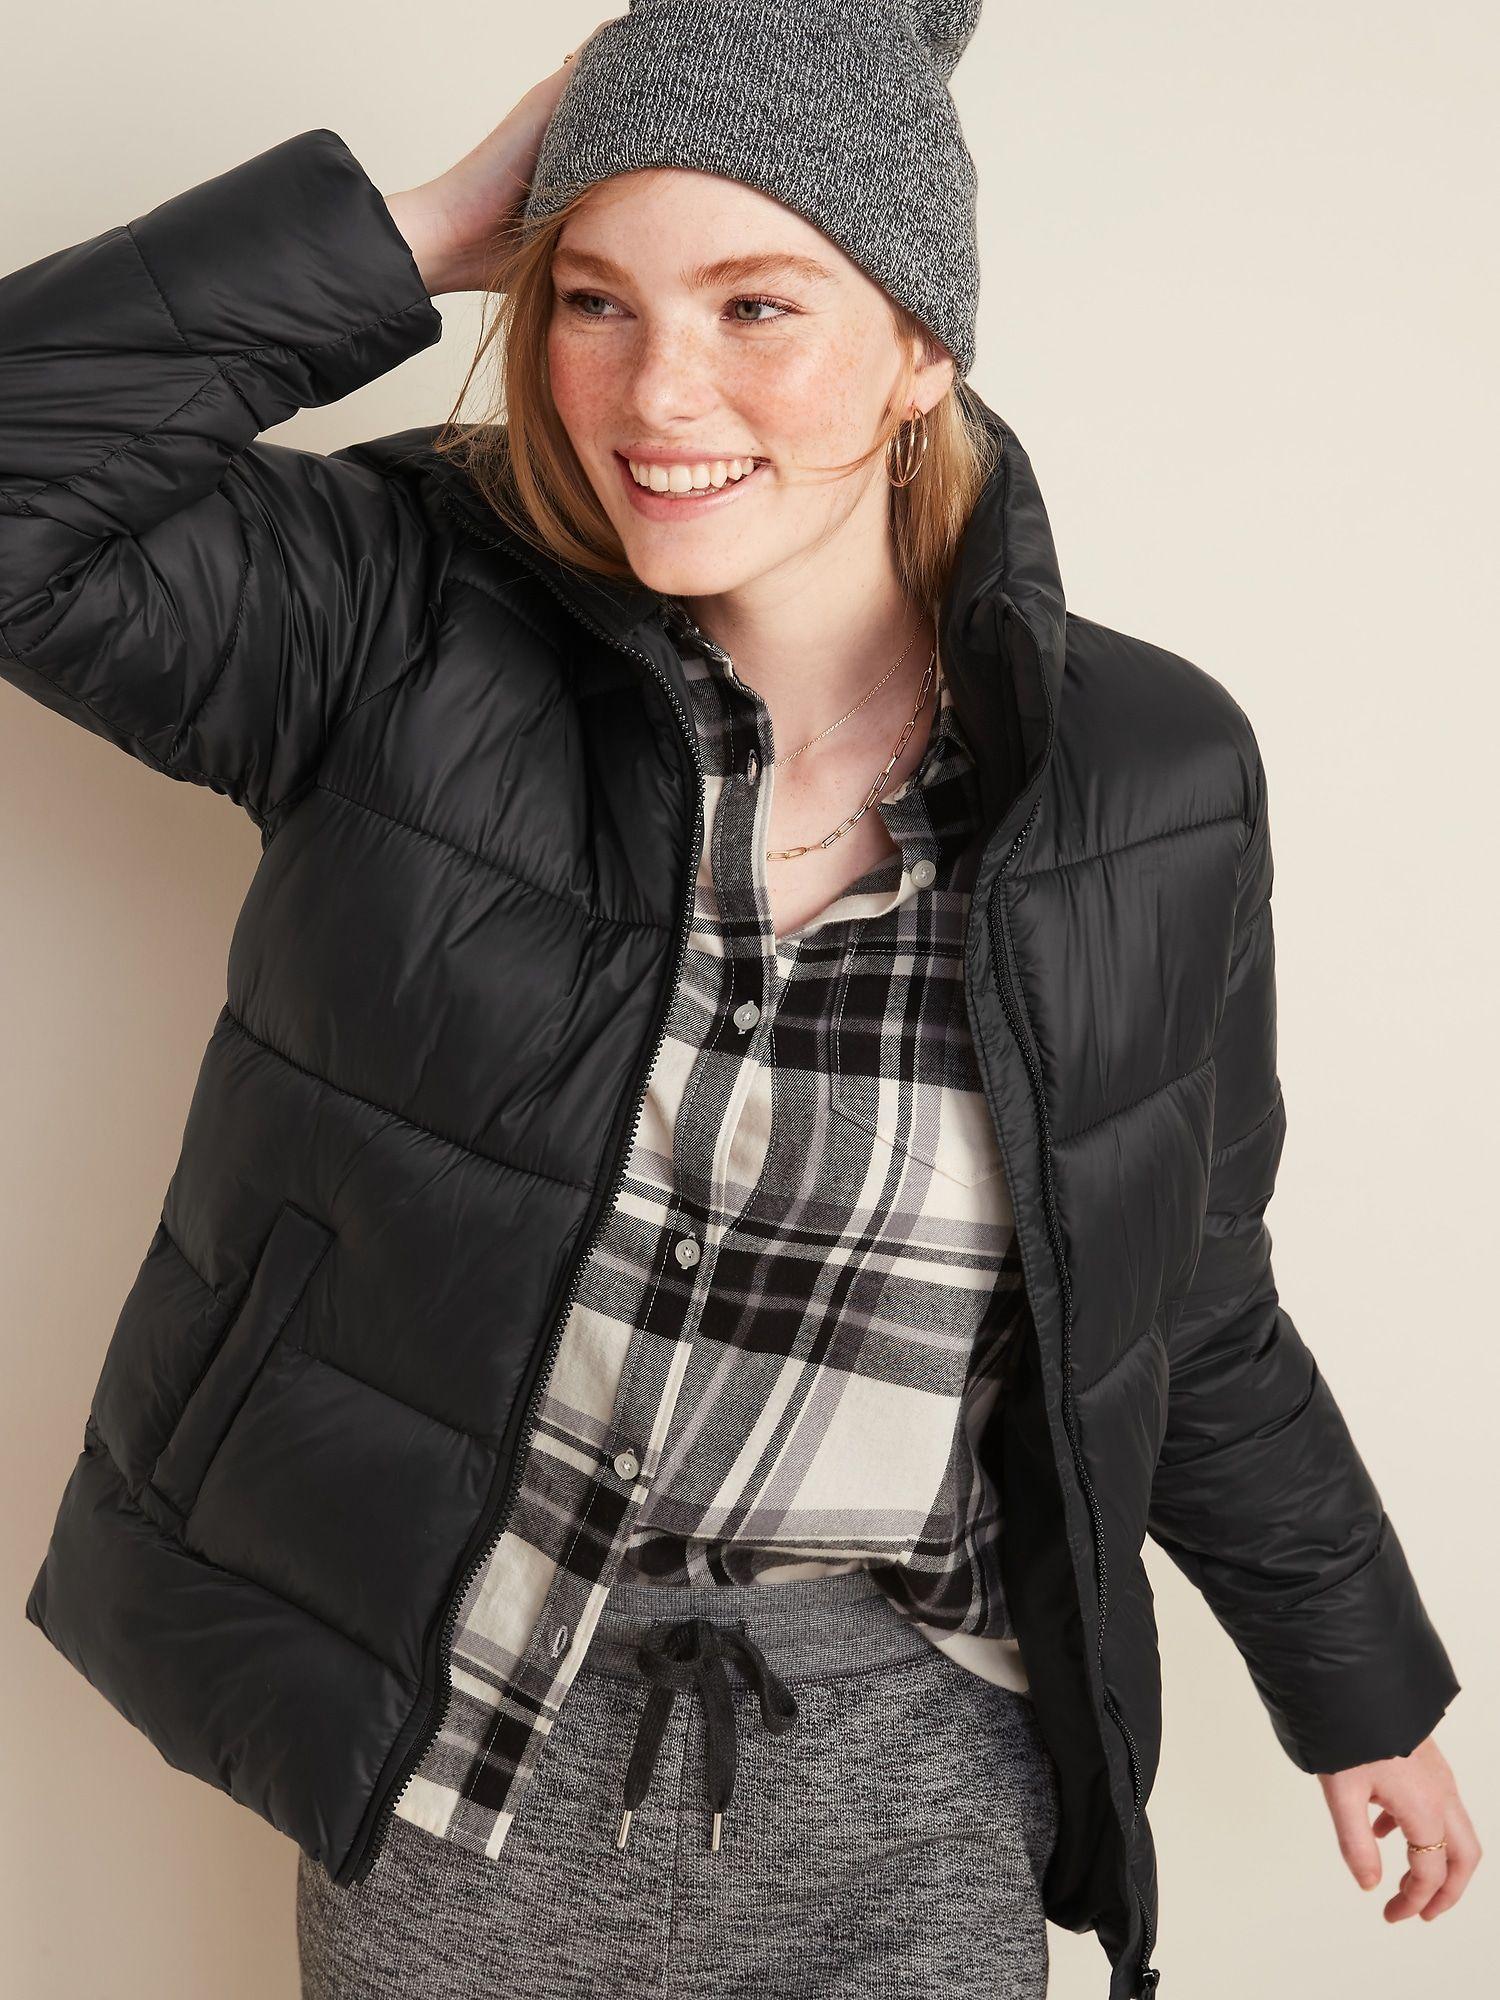 Frost Free Zip Front Puffer Jacket For Women Old Navy In 2021 Jackets For Women Short Black Jacket Black Winter Jacket [ 2000 x 1500 Pixel ]